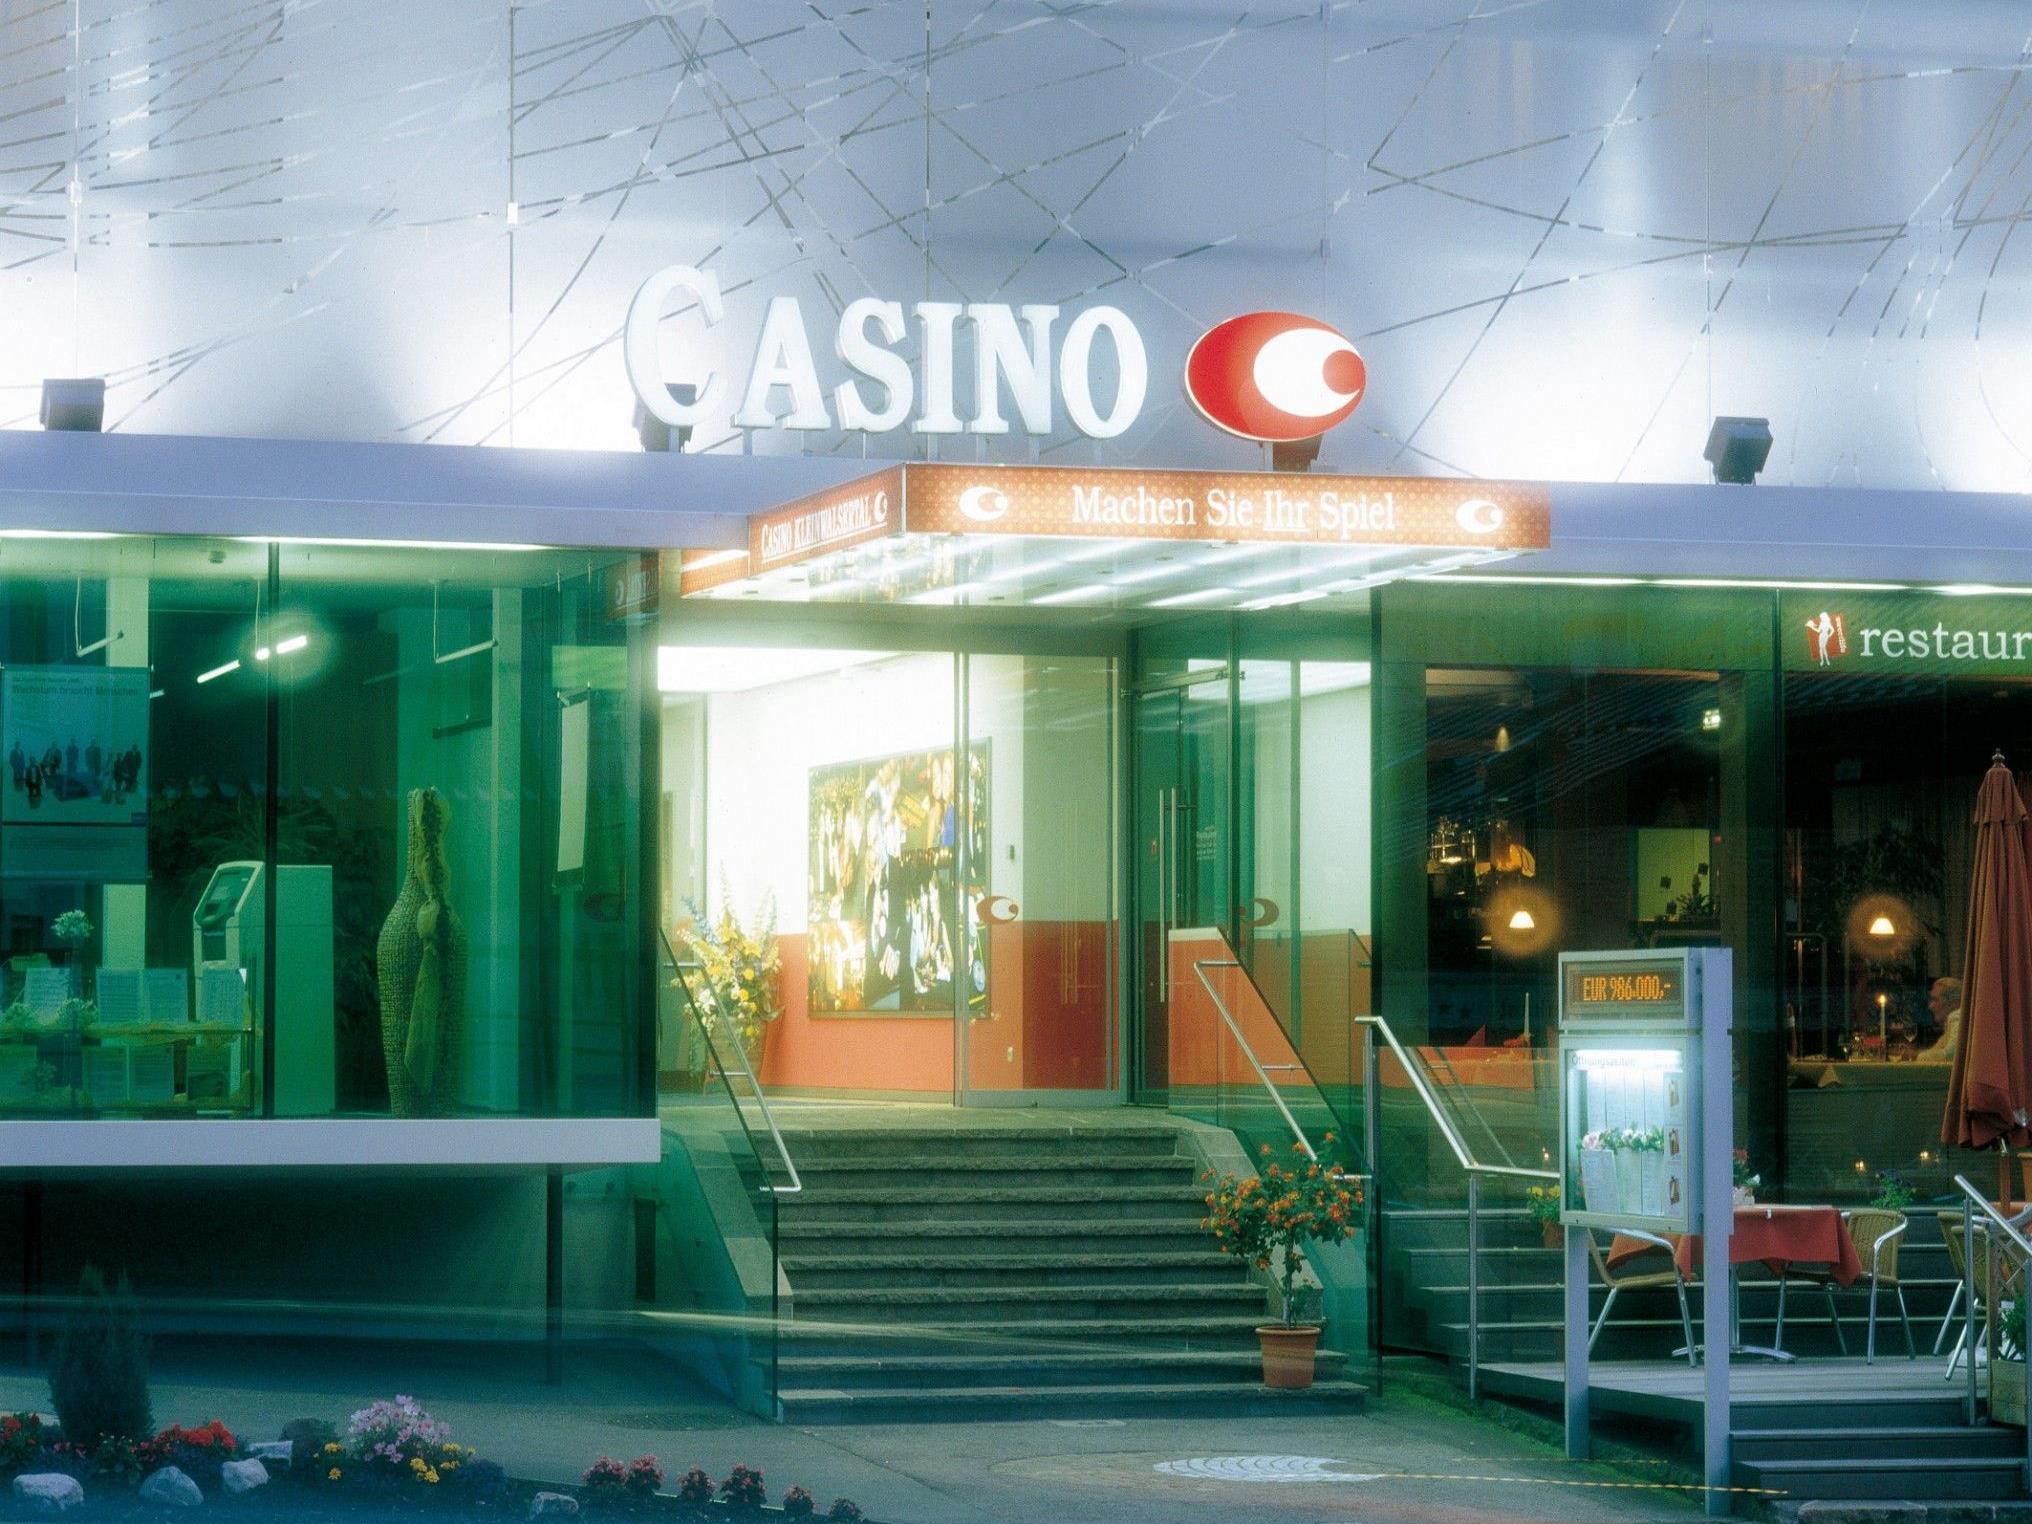 Damentage im Casino.